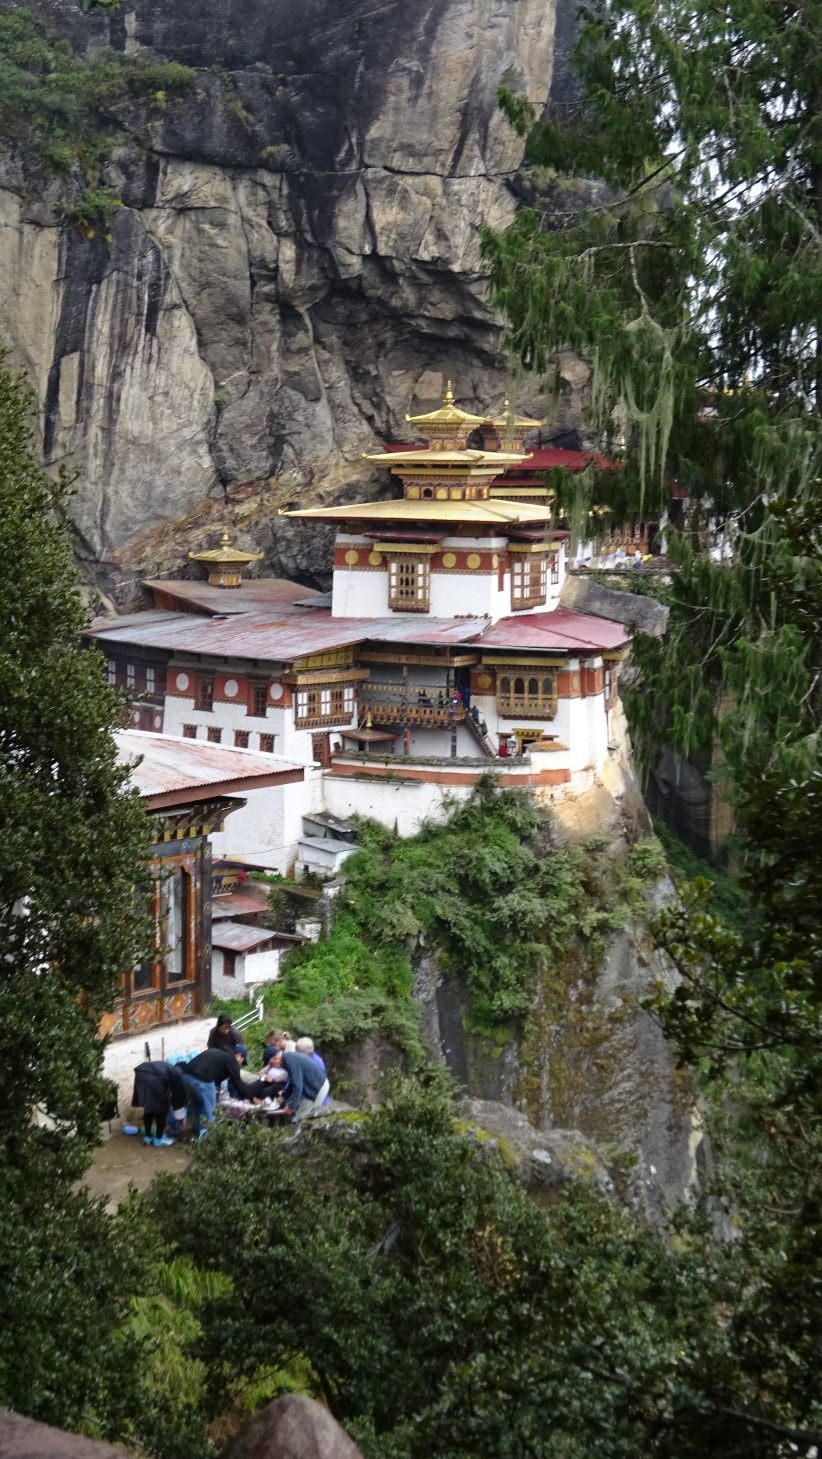 Tiger's Nest monastery at Taktsang, Paro, Bhutan copy-min